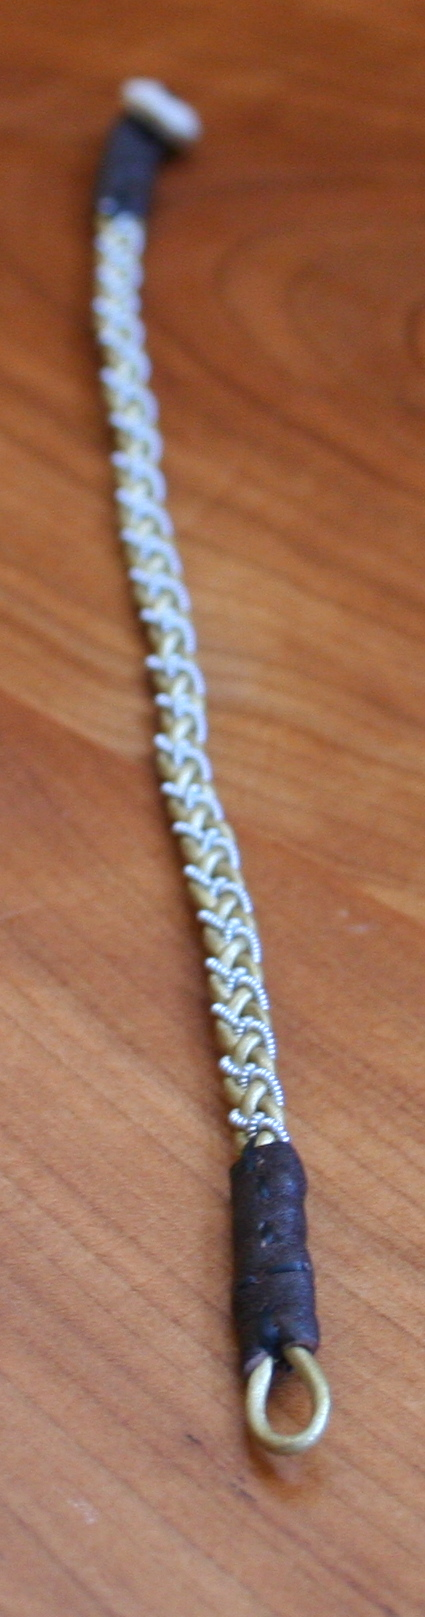 Mini Pewter Thread Bracelet green